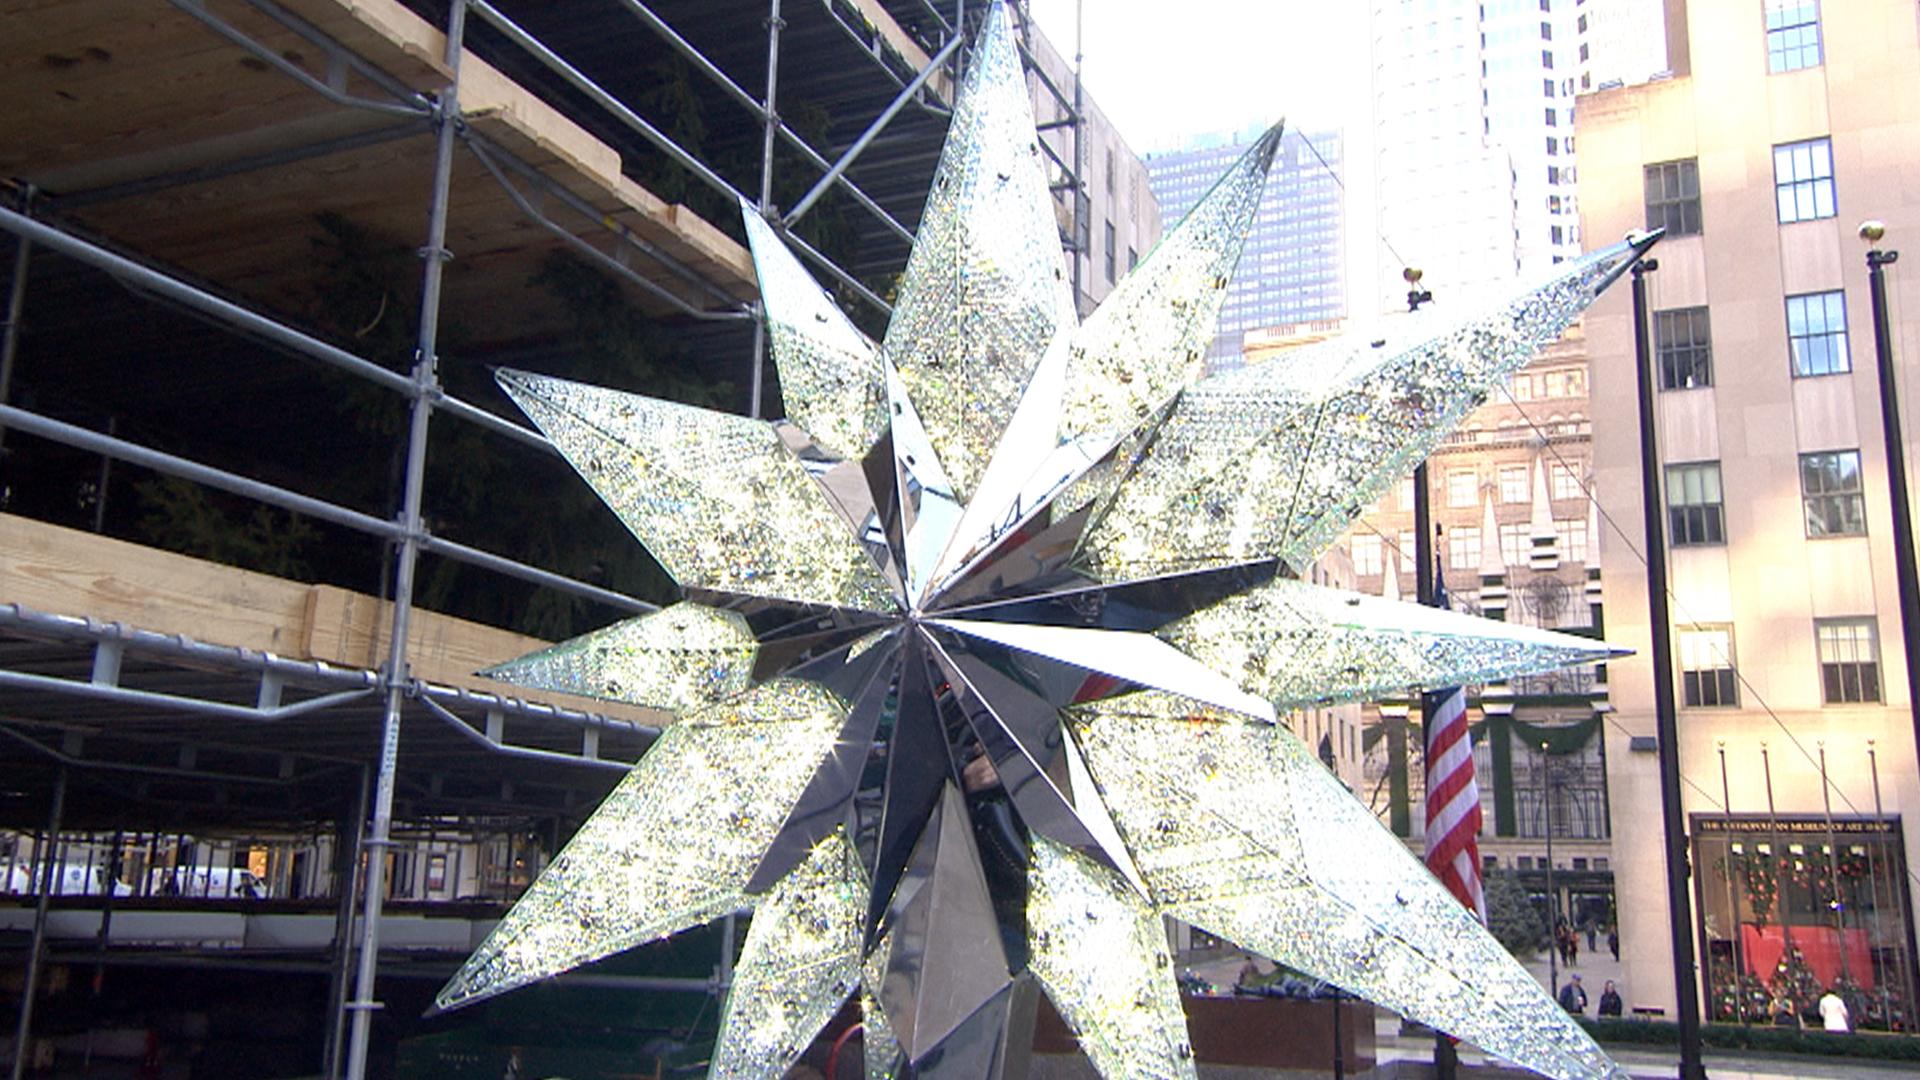 A first look at the Rockefeller Center Swarovski Christmas tree star